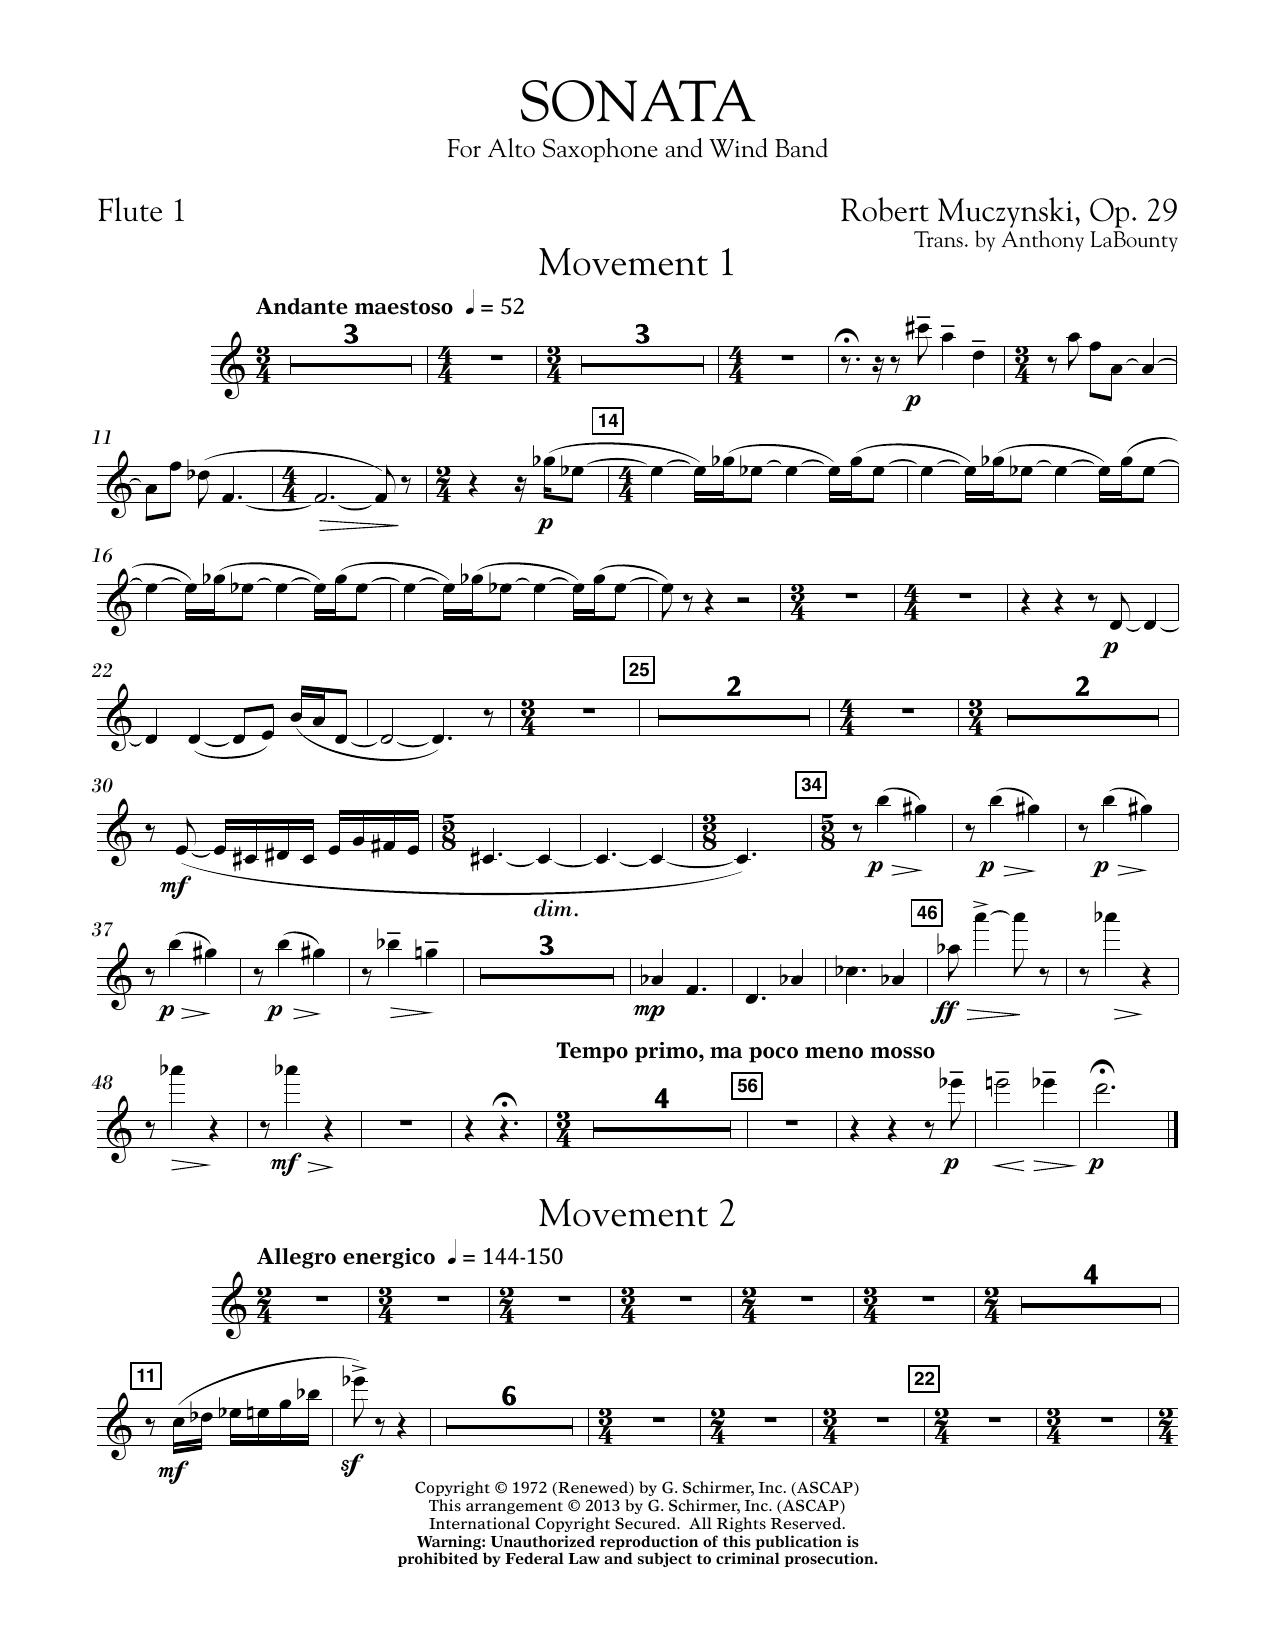 Sonata for Alto Saxophone, Op. 29 - Flute 1 (Concert Band)